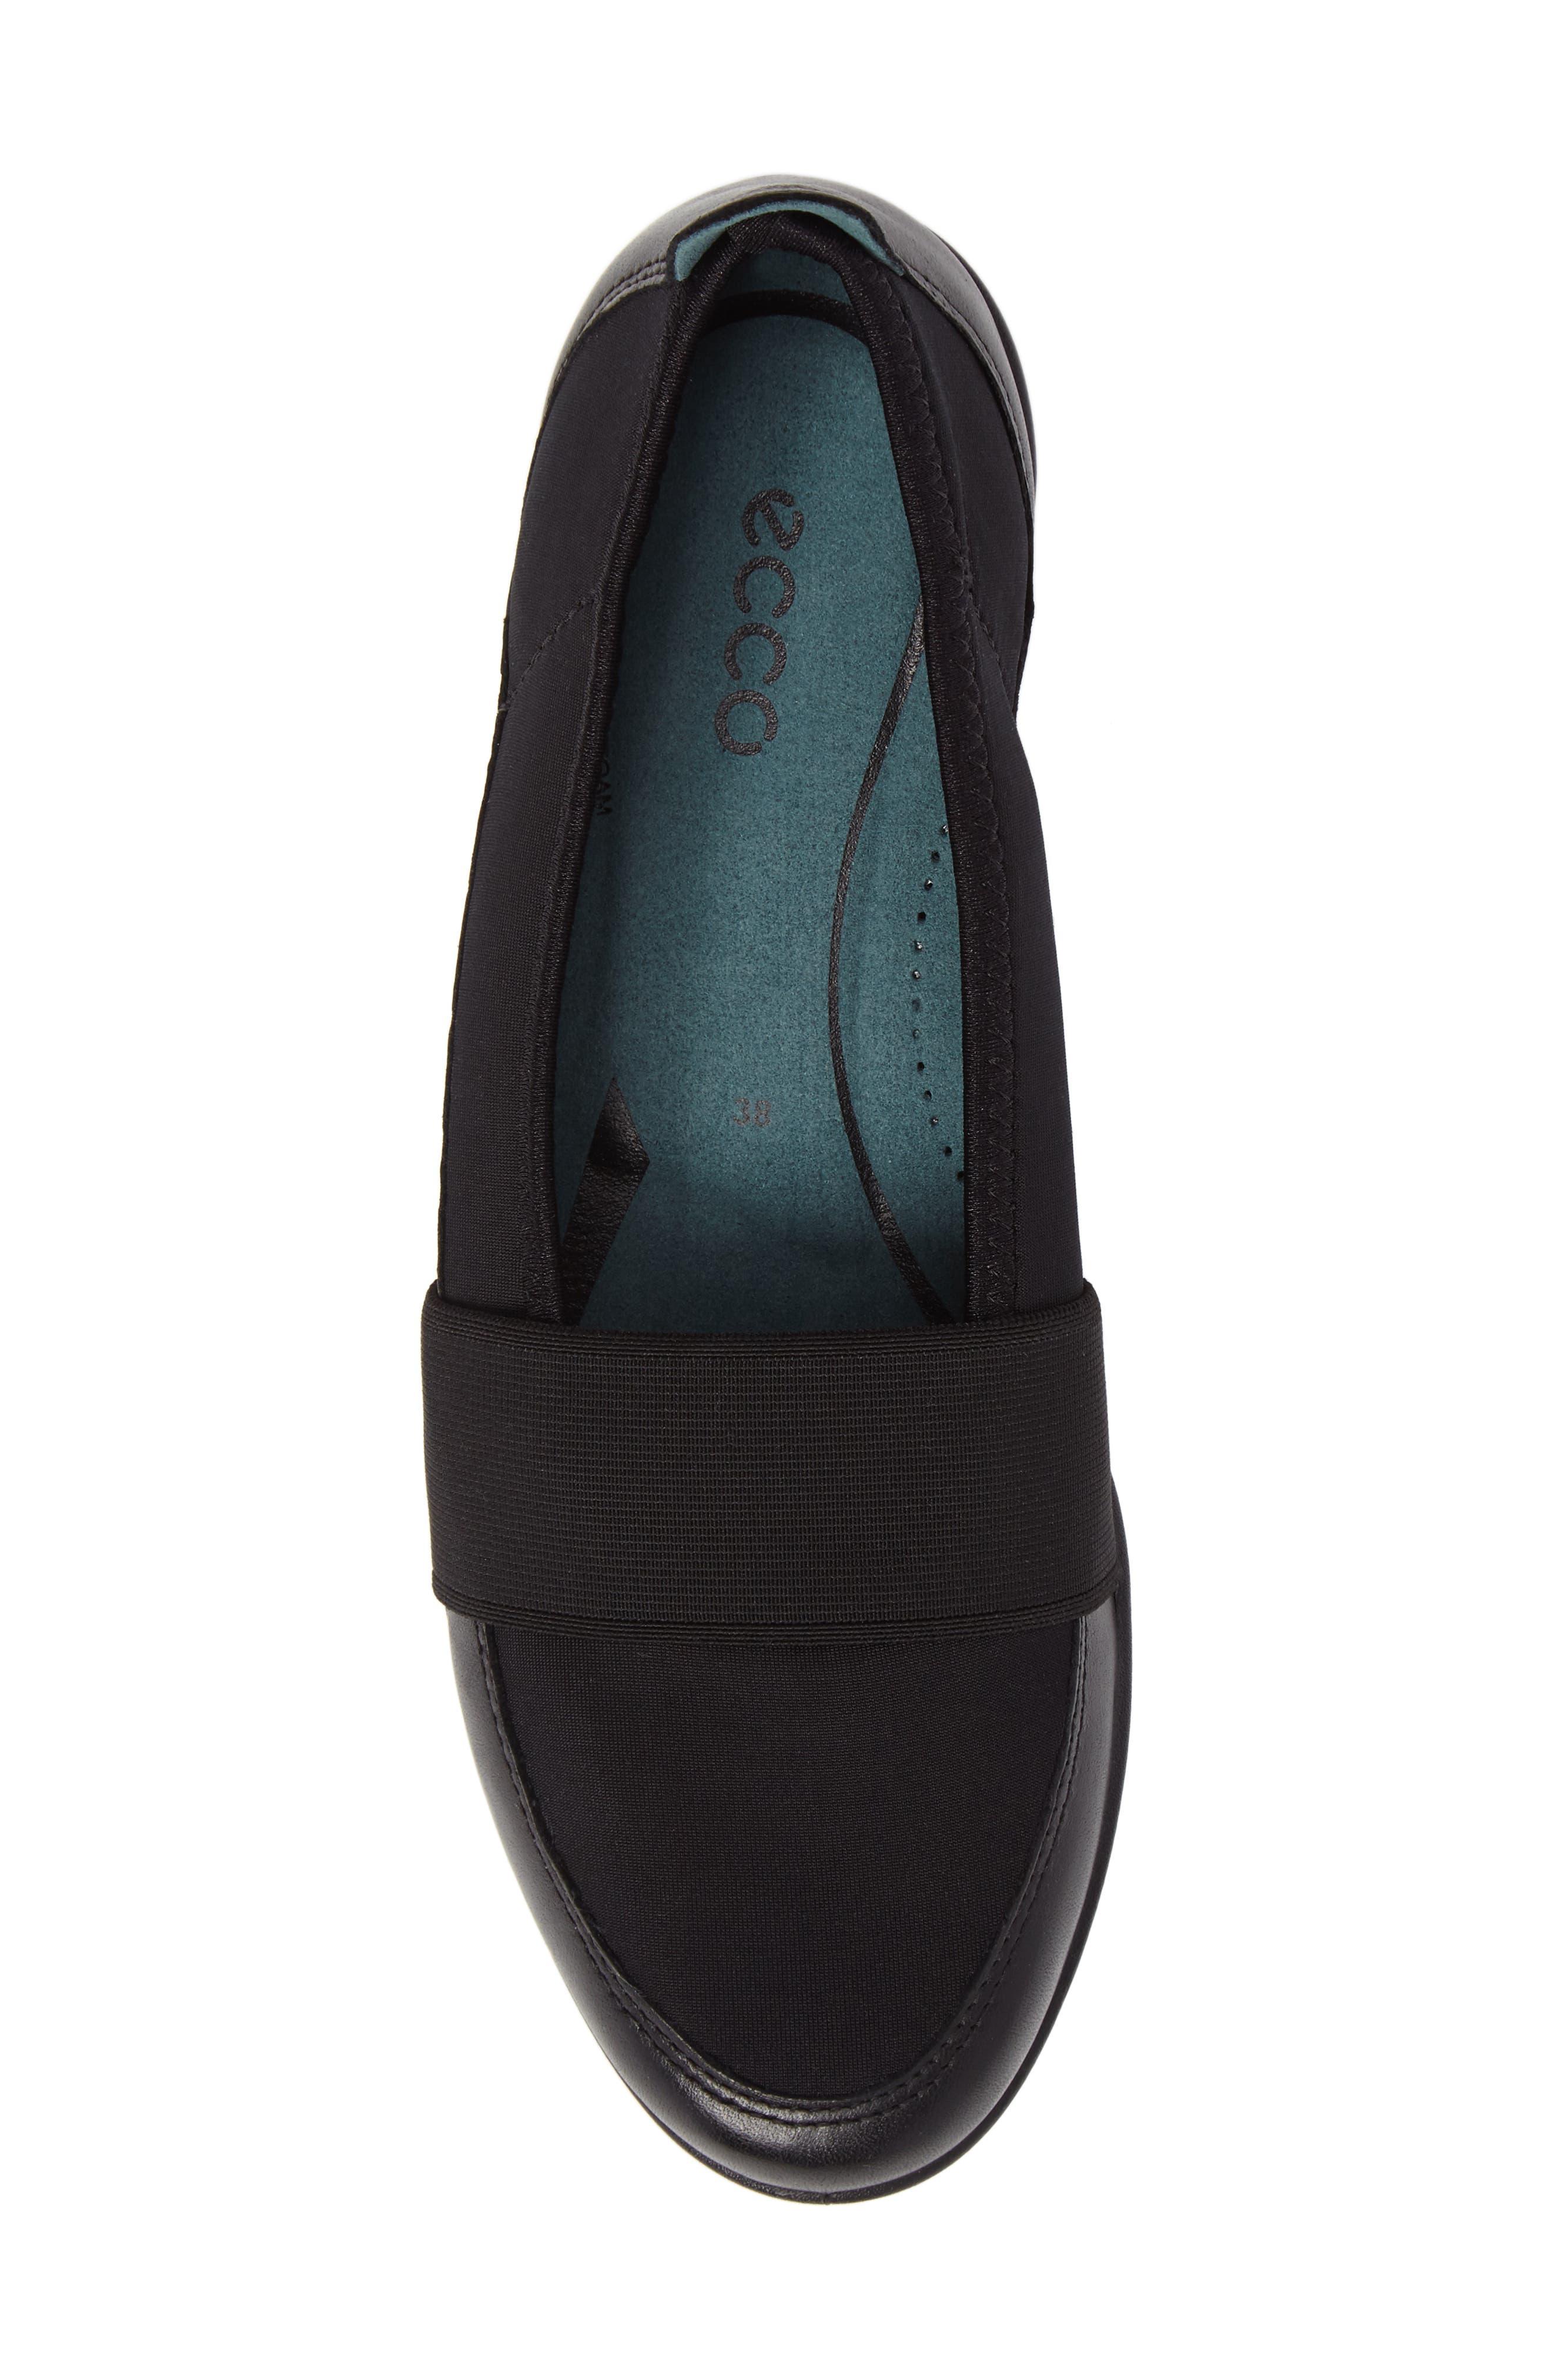 'Bluma' Slip-On Sneaker,                             Alternate thumbnail 5, color,                             Black Leather